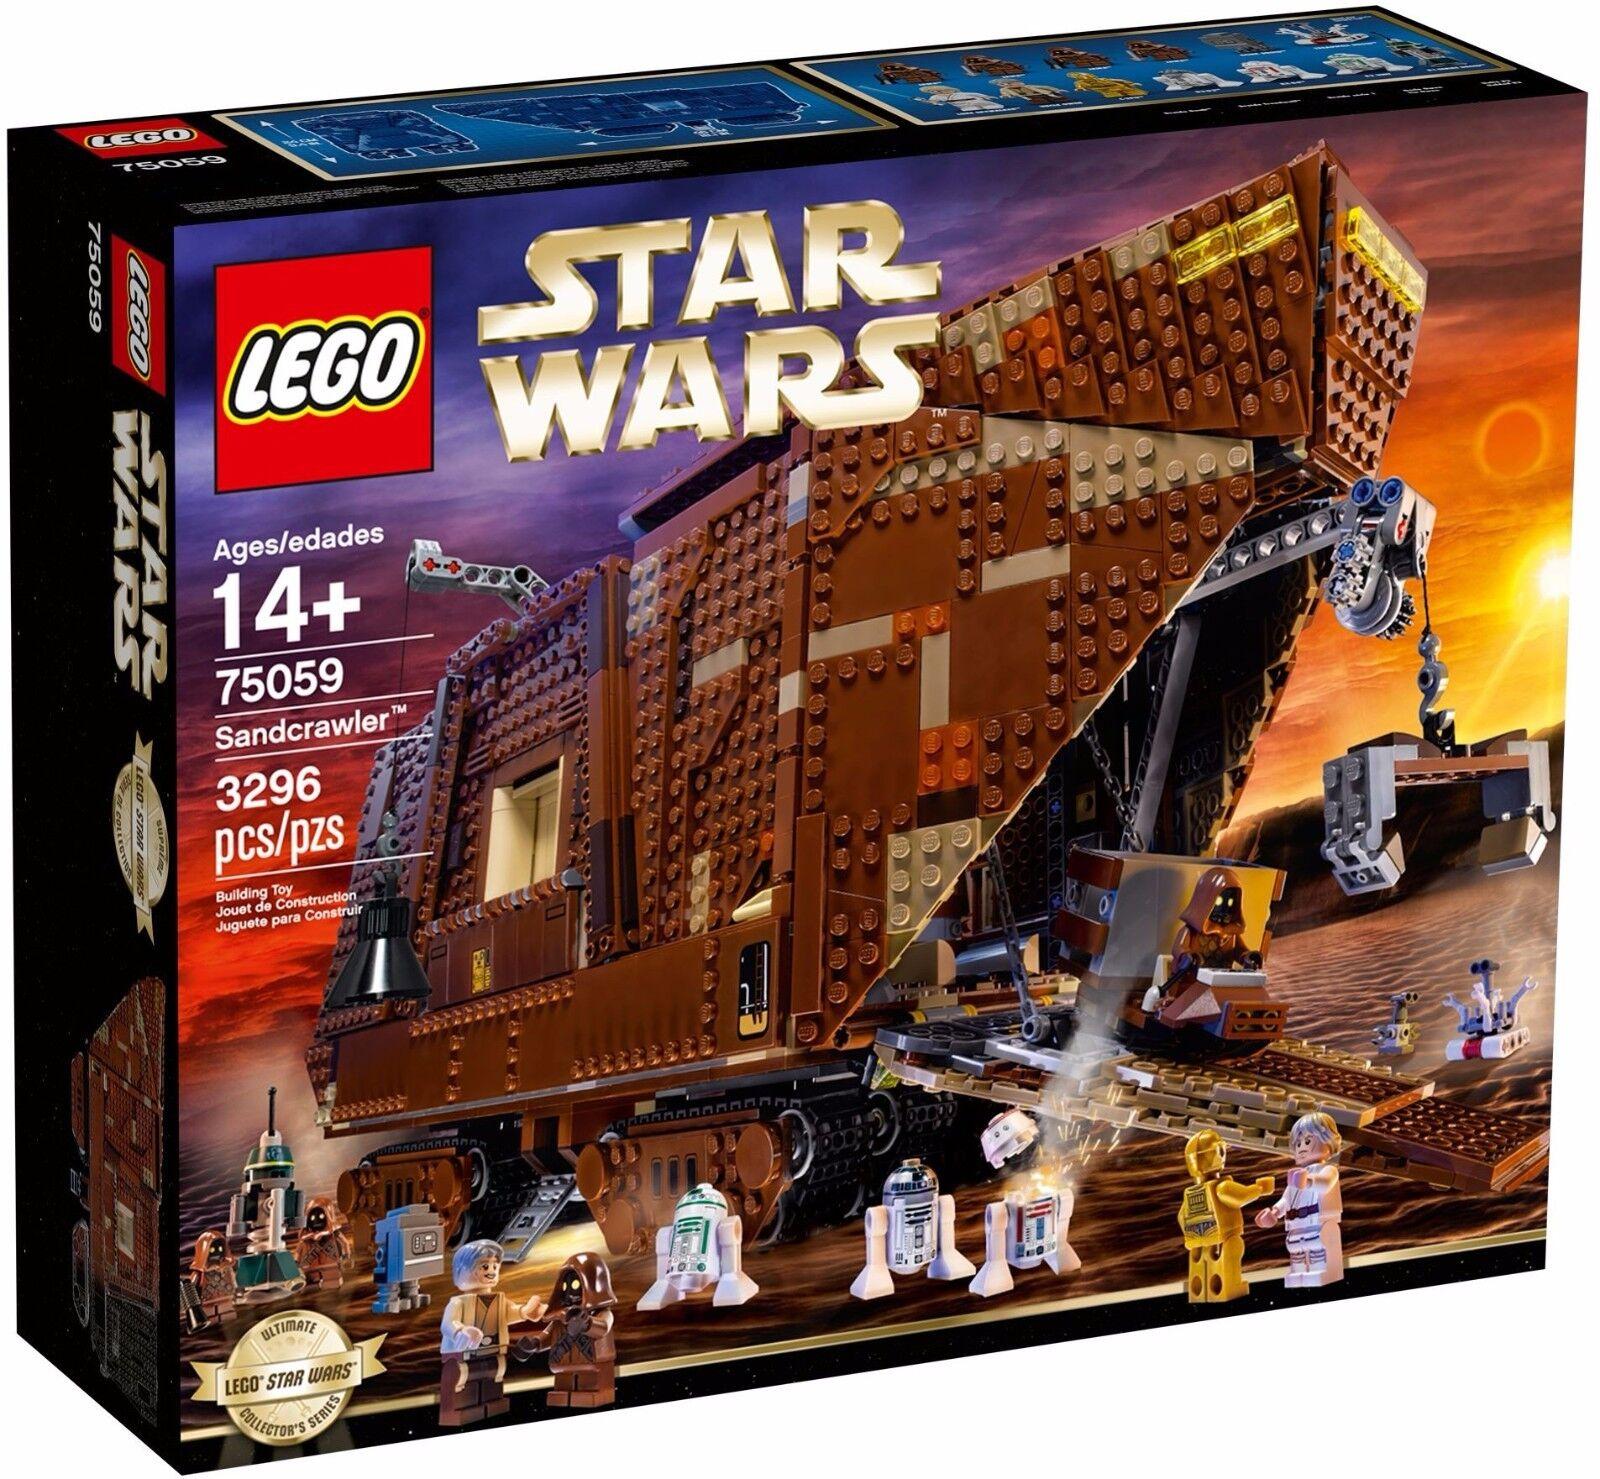 LEGO Star Wars 75059 UCS Sandcrawler - Brand New & Sealed Free UK Delivery